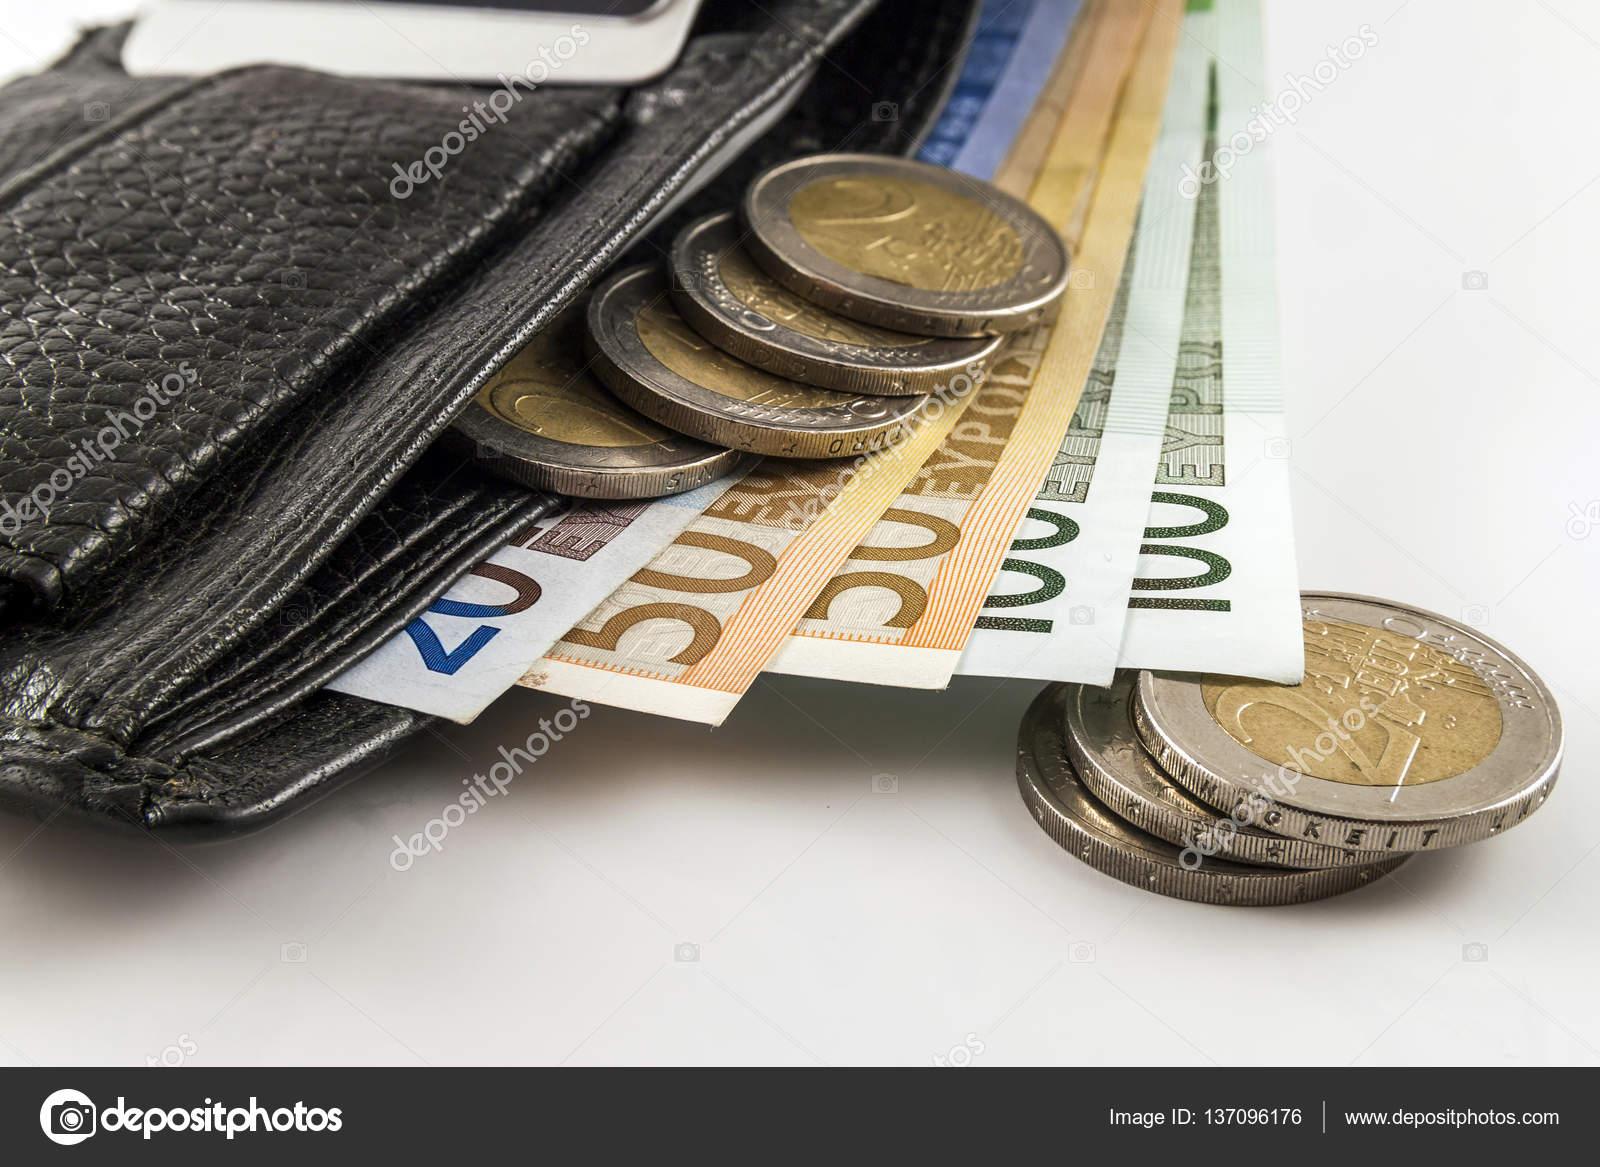 d431748cf8 Δερμάτινο ανδρικό ανοιχτό πορτοφόλι με γραμμάτια τραπεζογραμματίων ευρώ